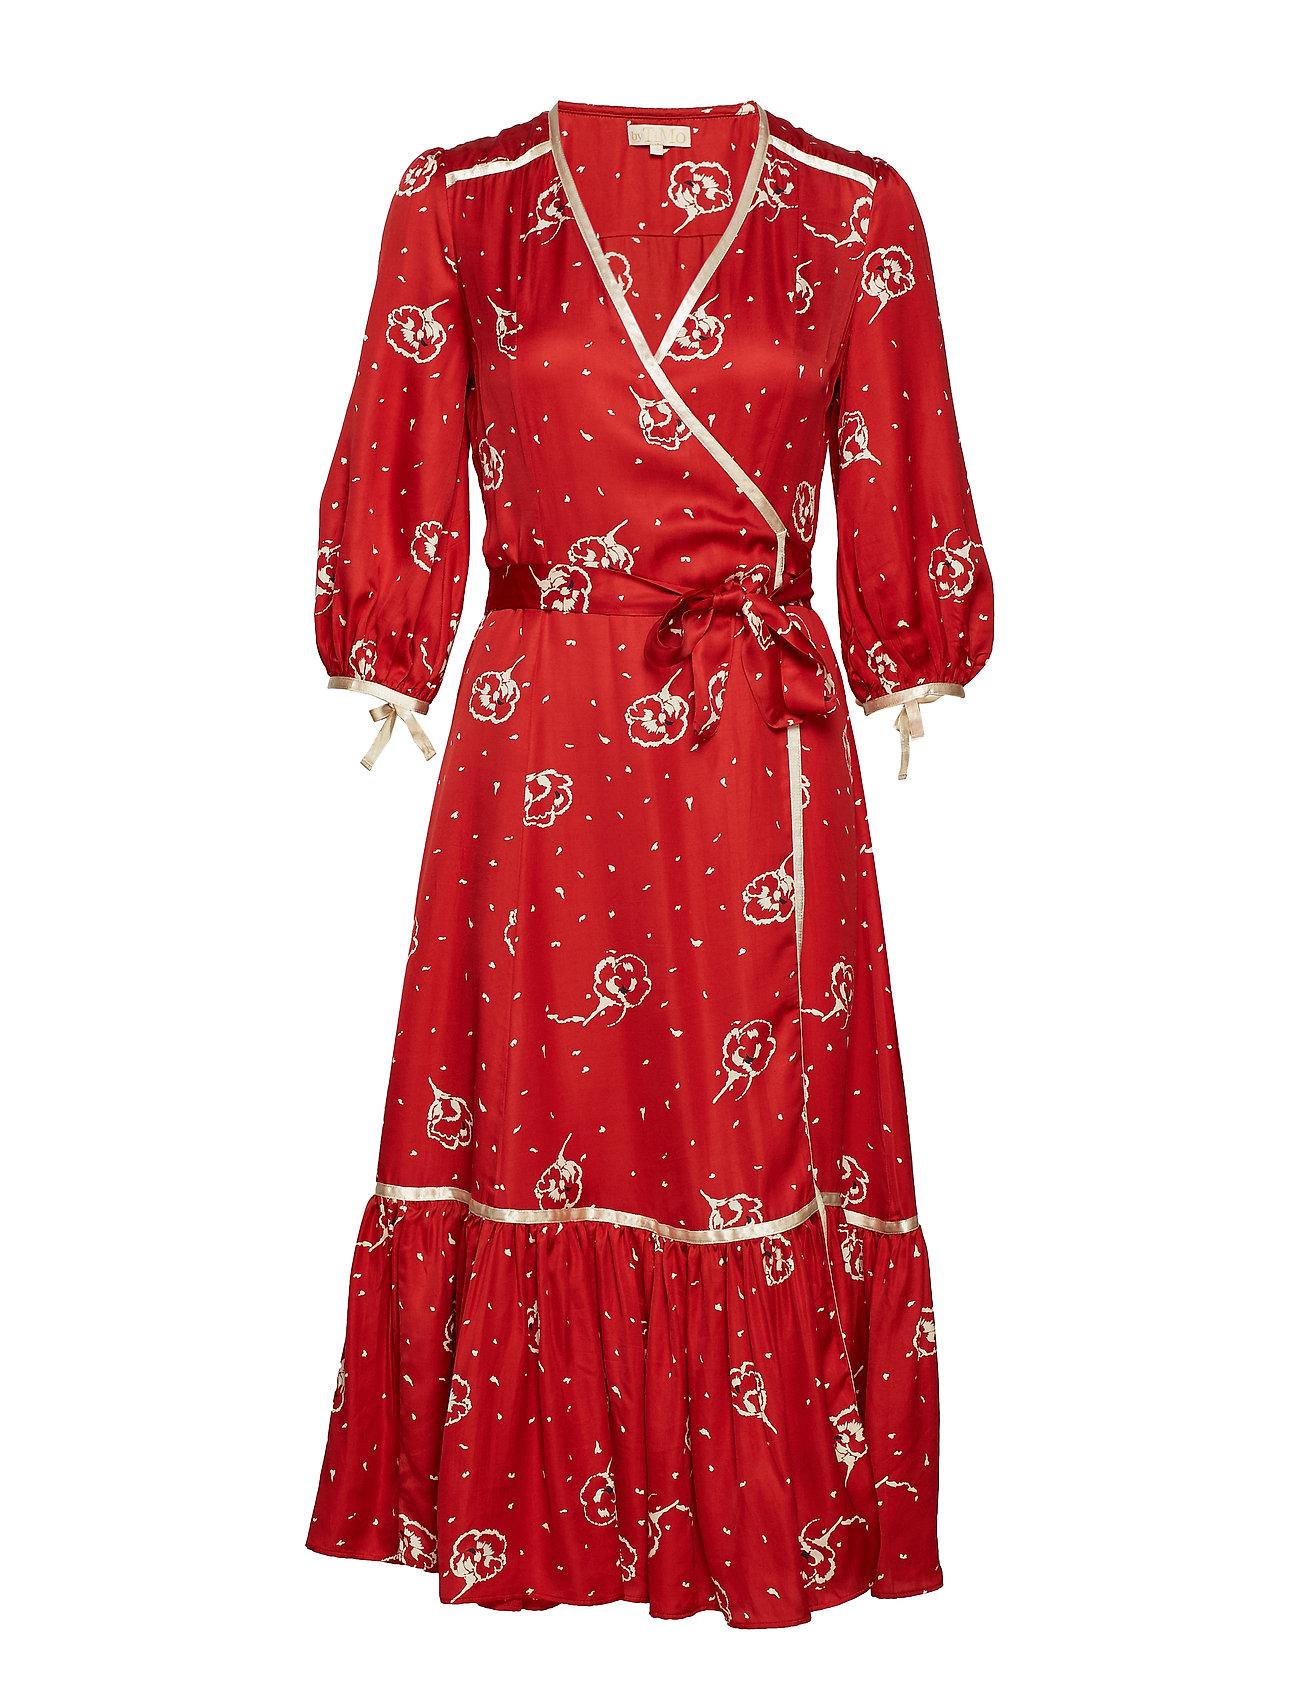 Contrast Wrap Dress801 Ti Mo RosaleenBy QCxrdBoWe